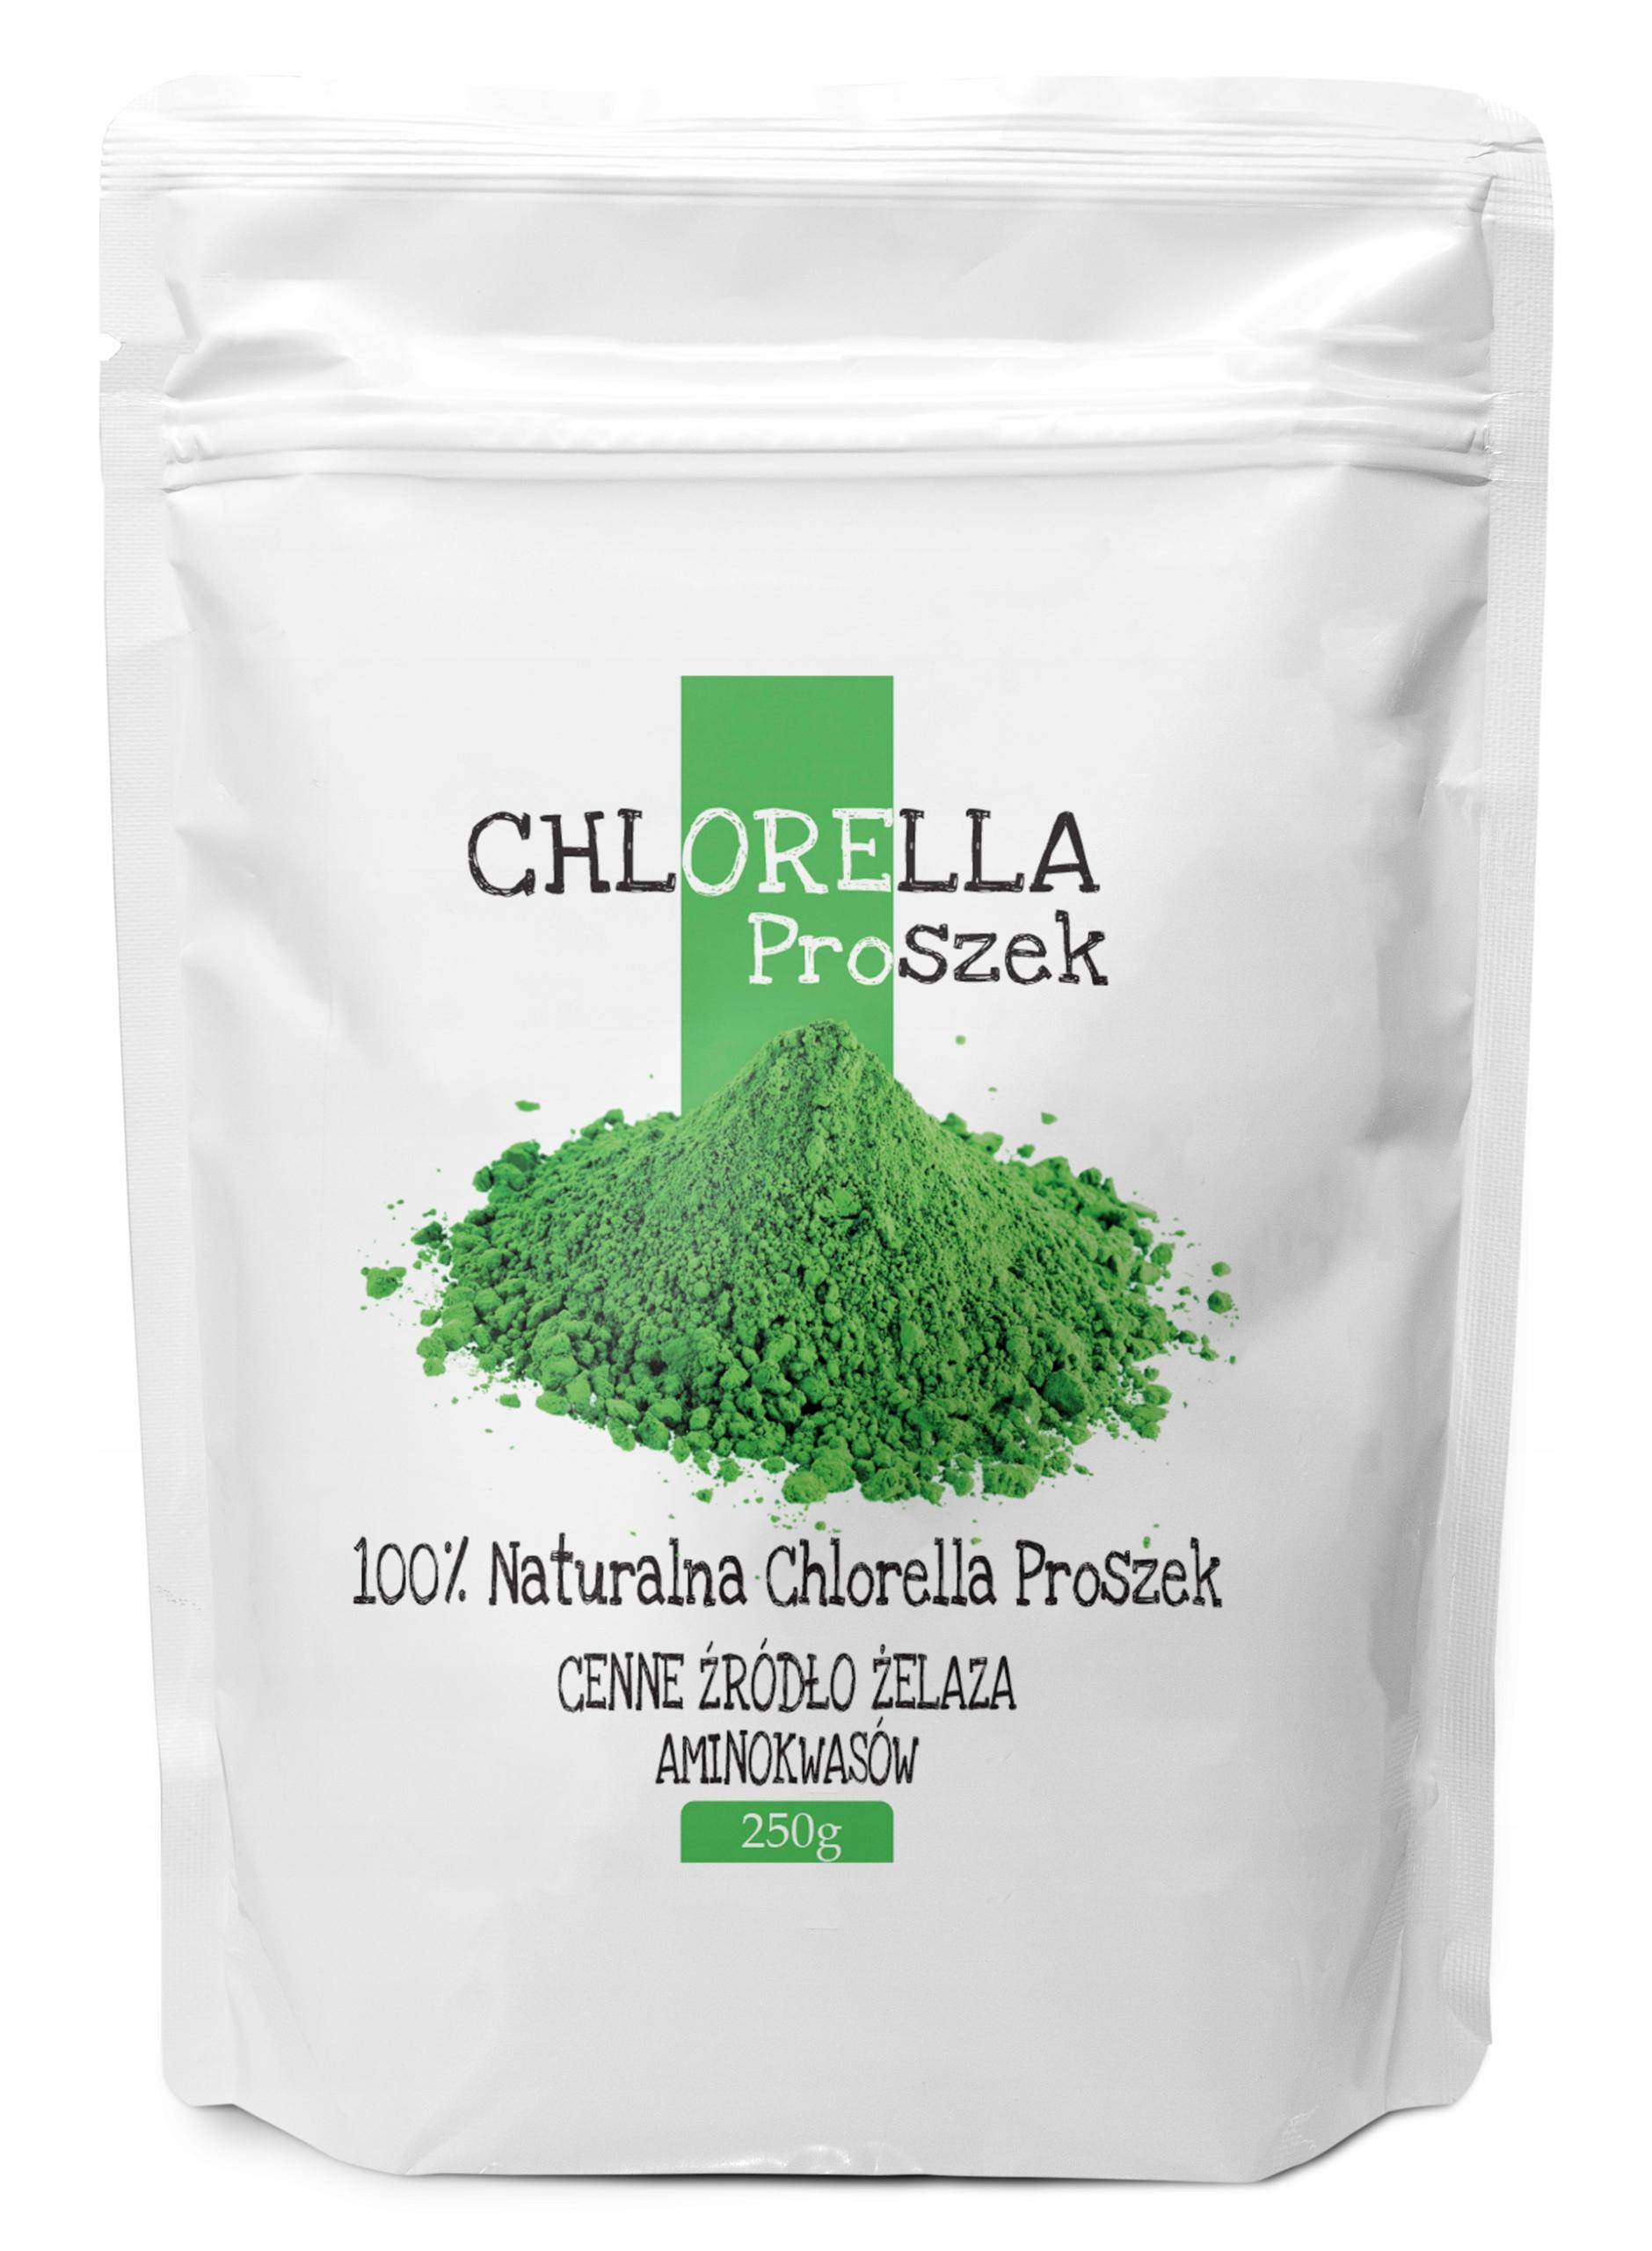 CHLORELLA 250g proszek naturalna, algi / BIOSWENA